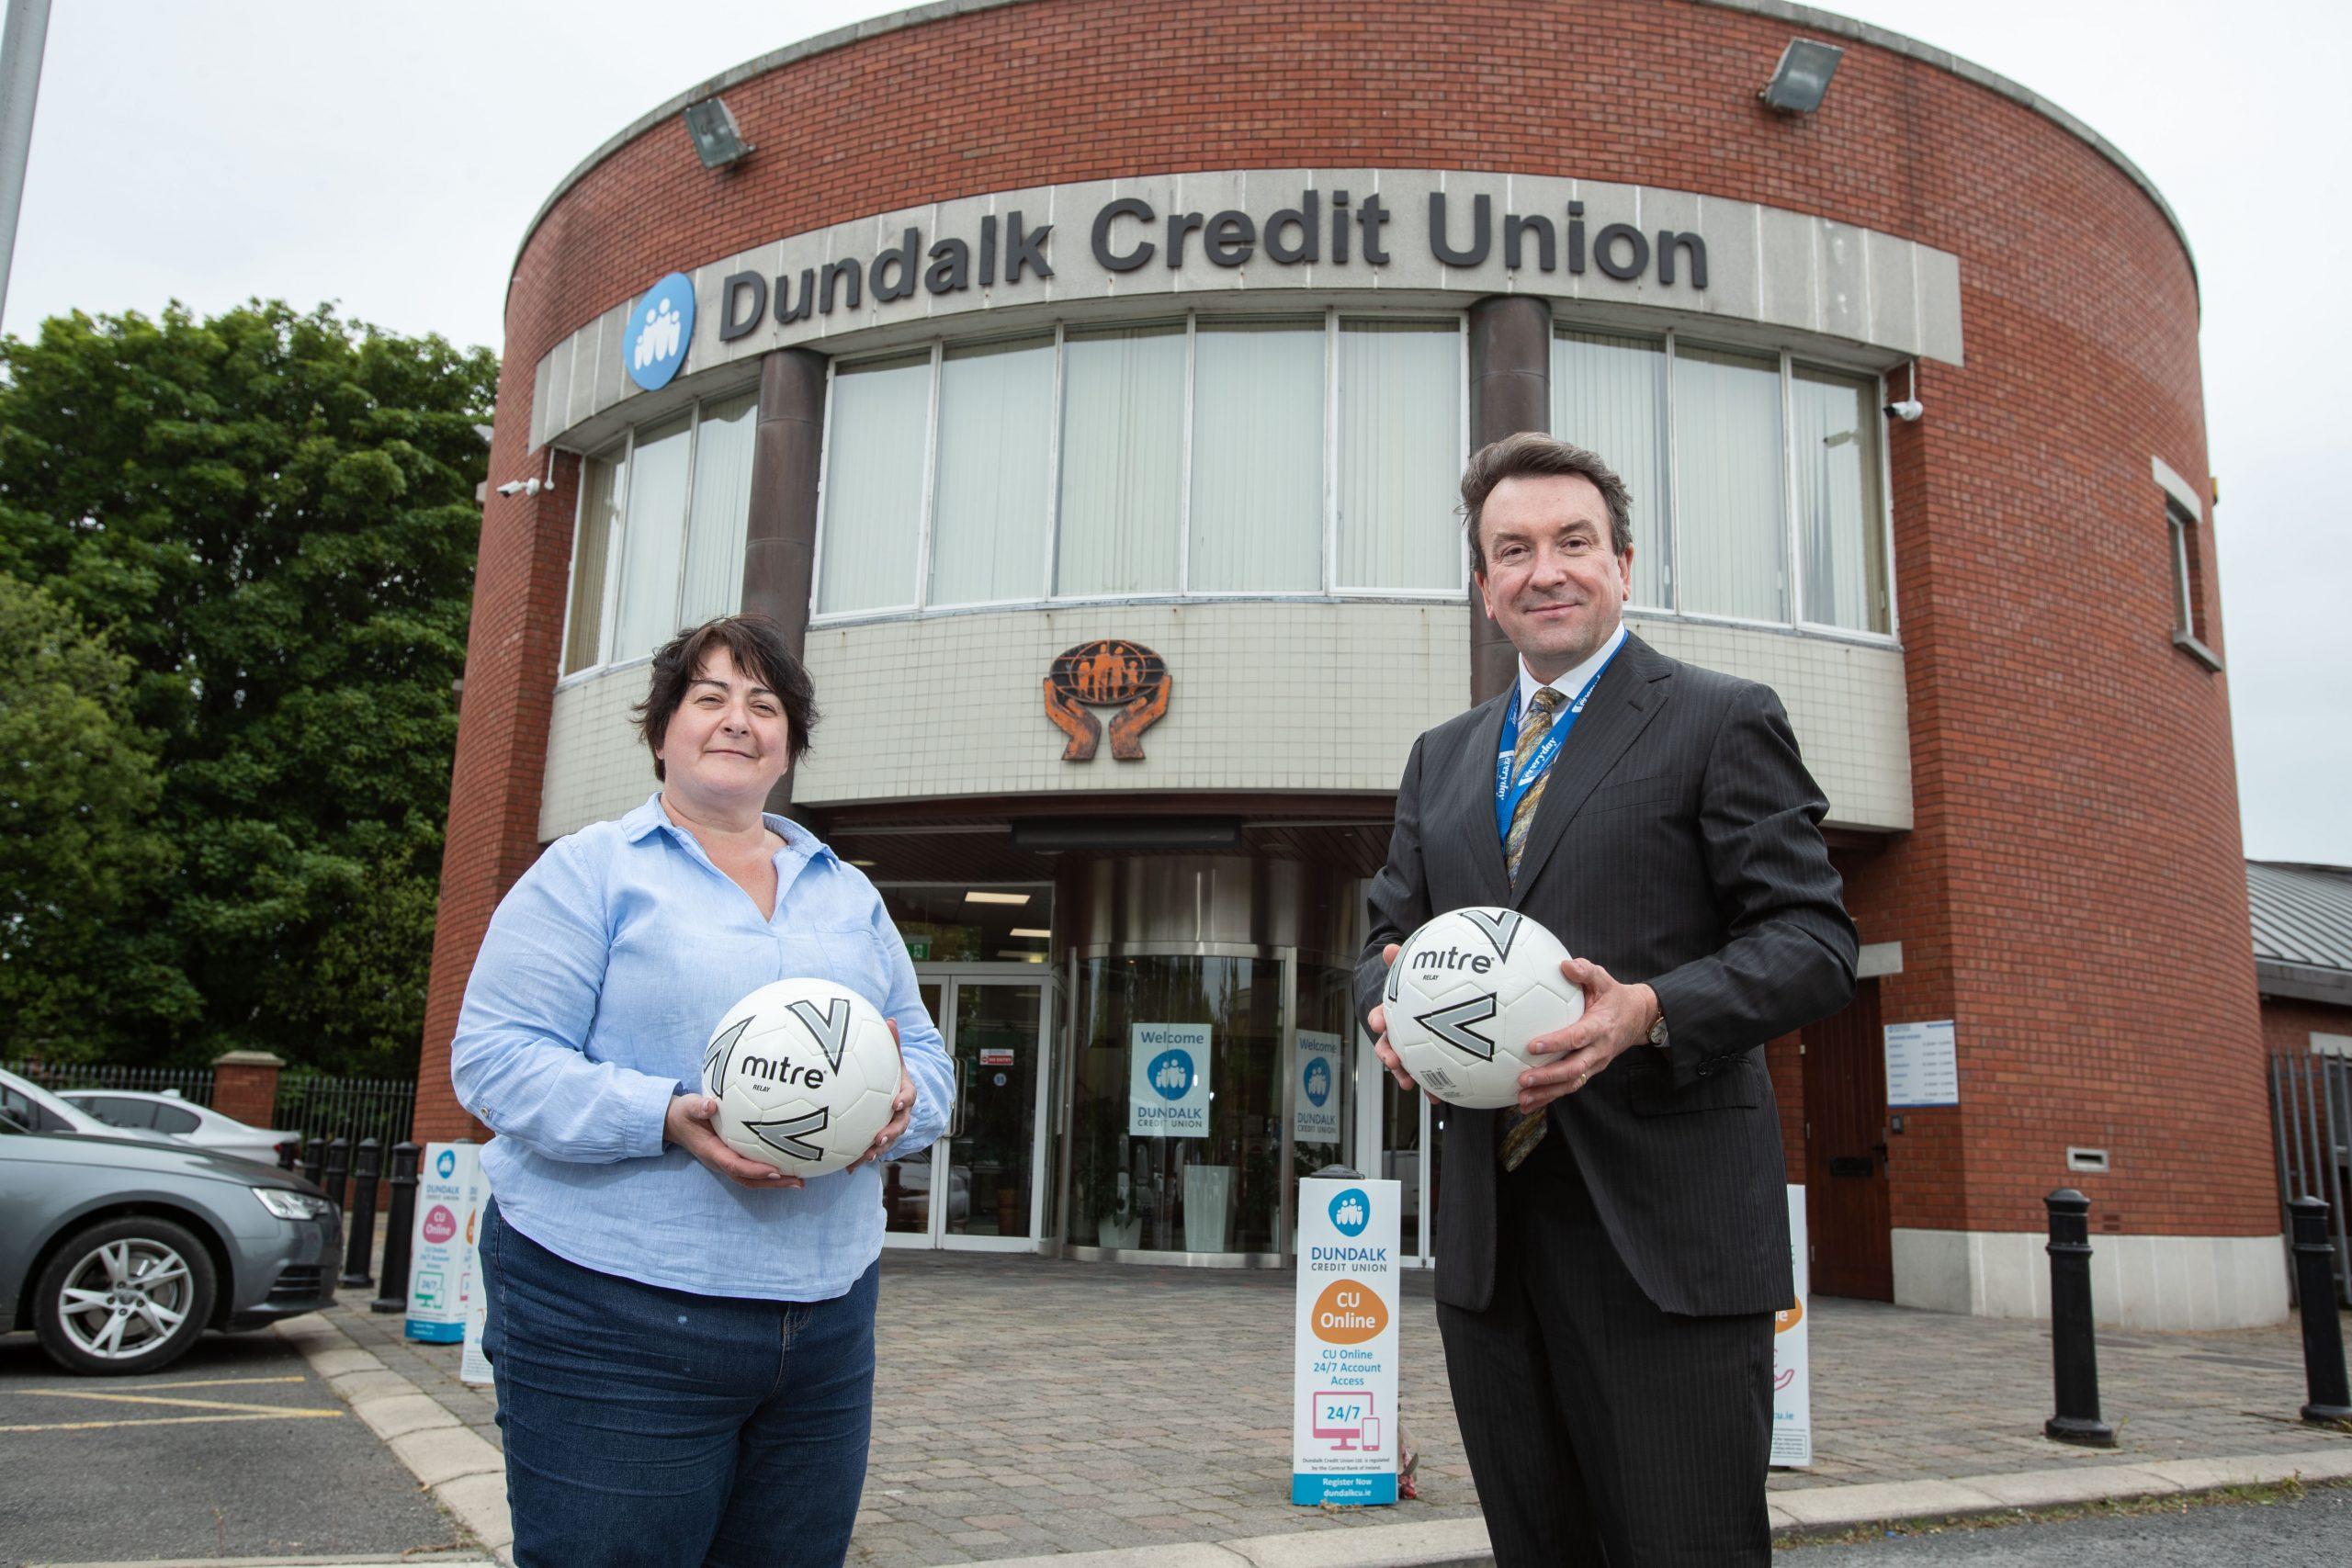 Dundalk School Boys League Sponsorship